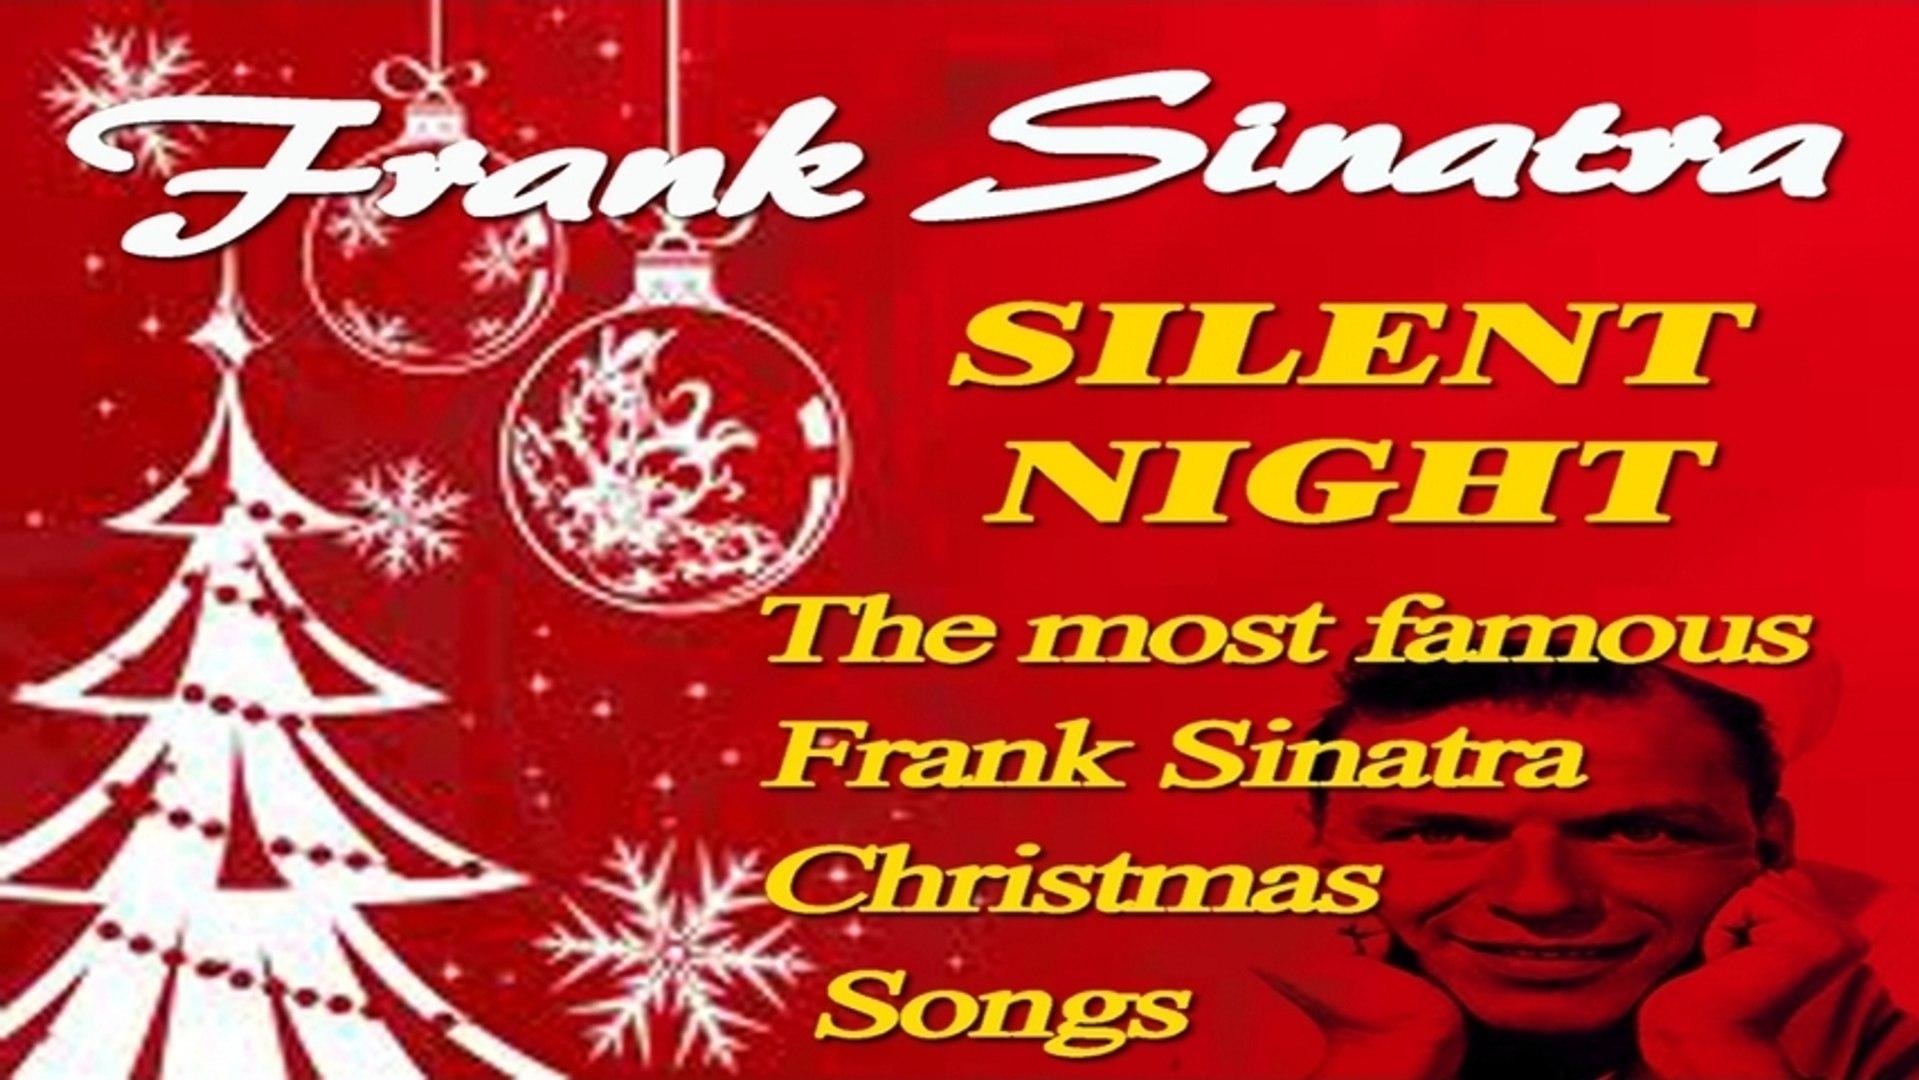 Frank Sinatra Christmas.Frank Sinatra Silent Night The Most Famous Frank Sinatra Christmas Songs